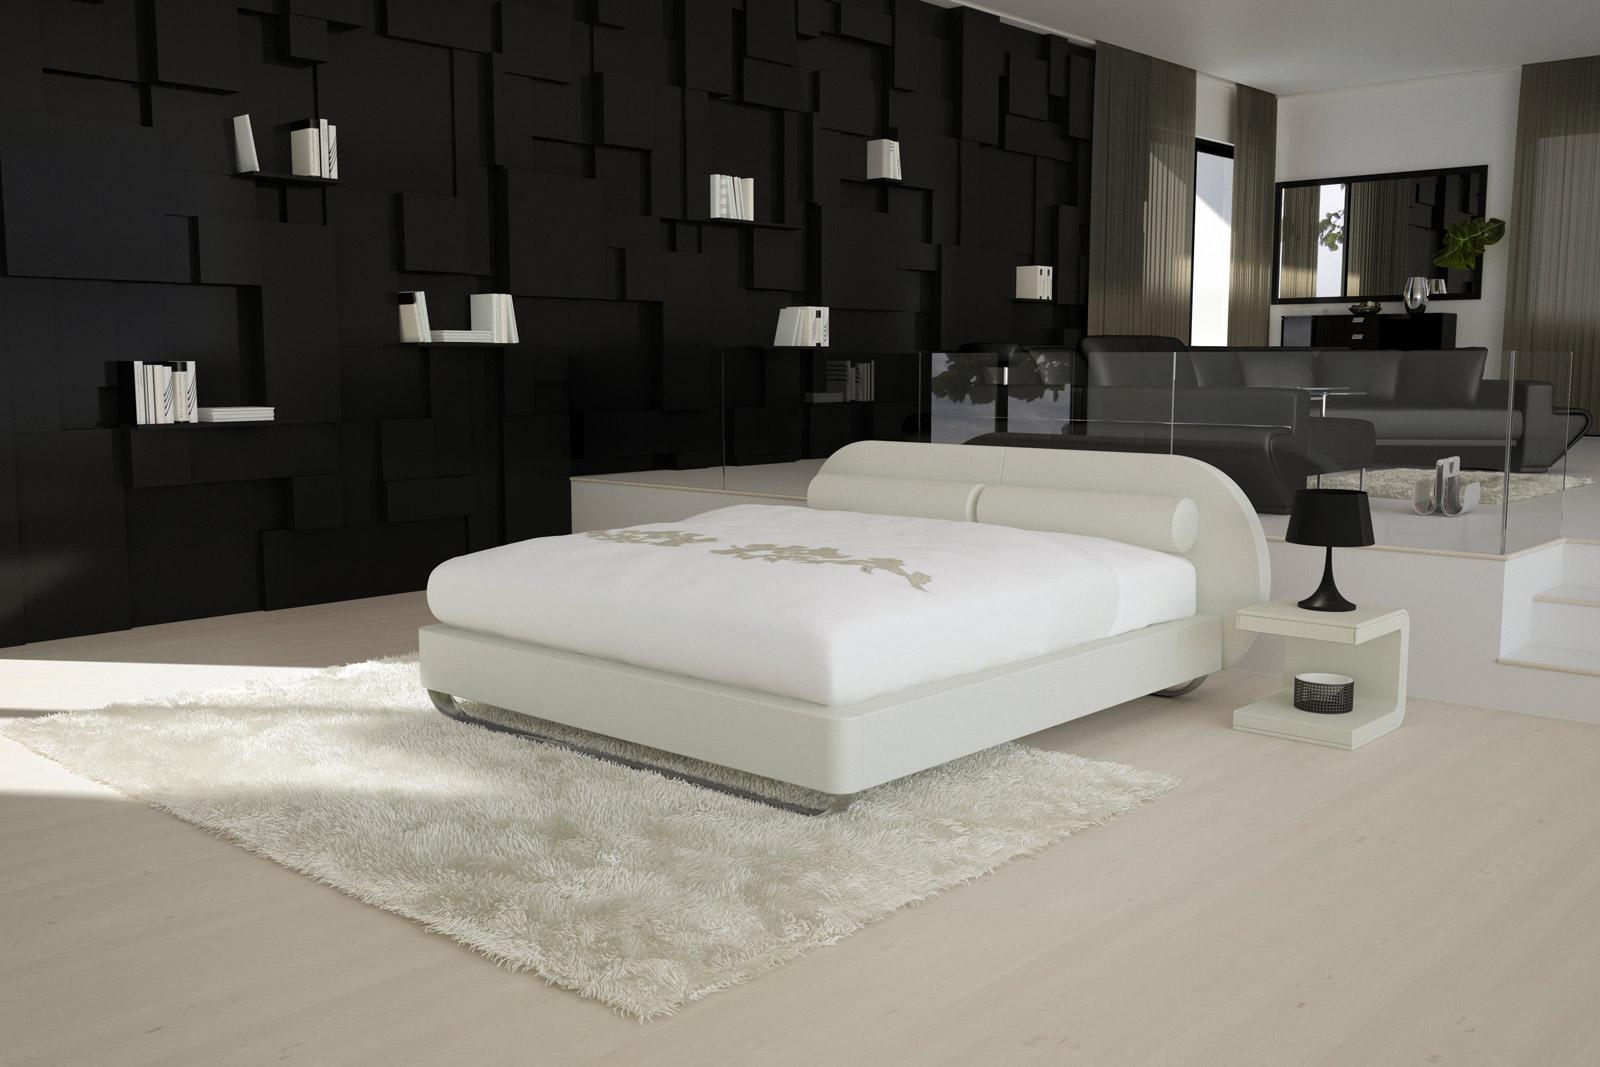 sam design boxspringbett 180 x 200 cm wei moove. Black Bedroom Furniture Sets. Home Design Ideas